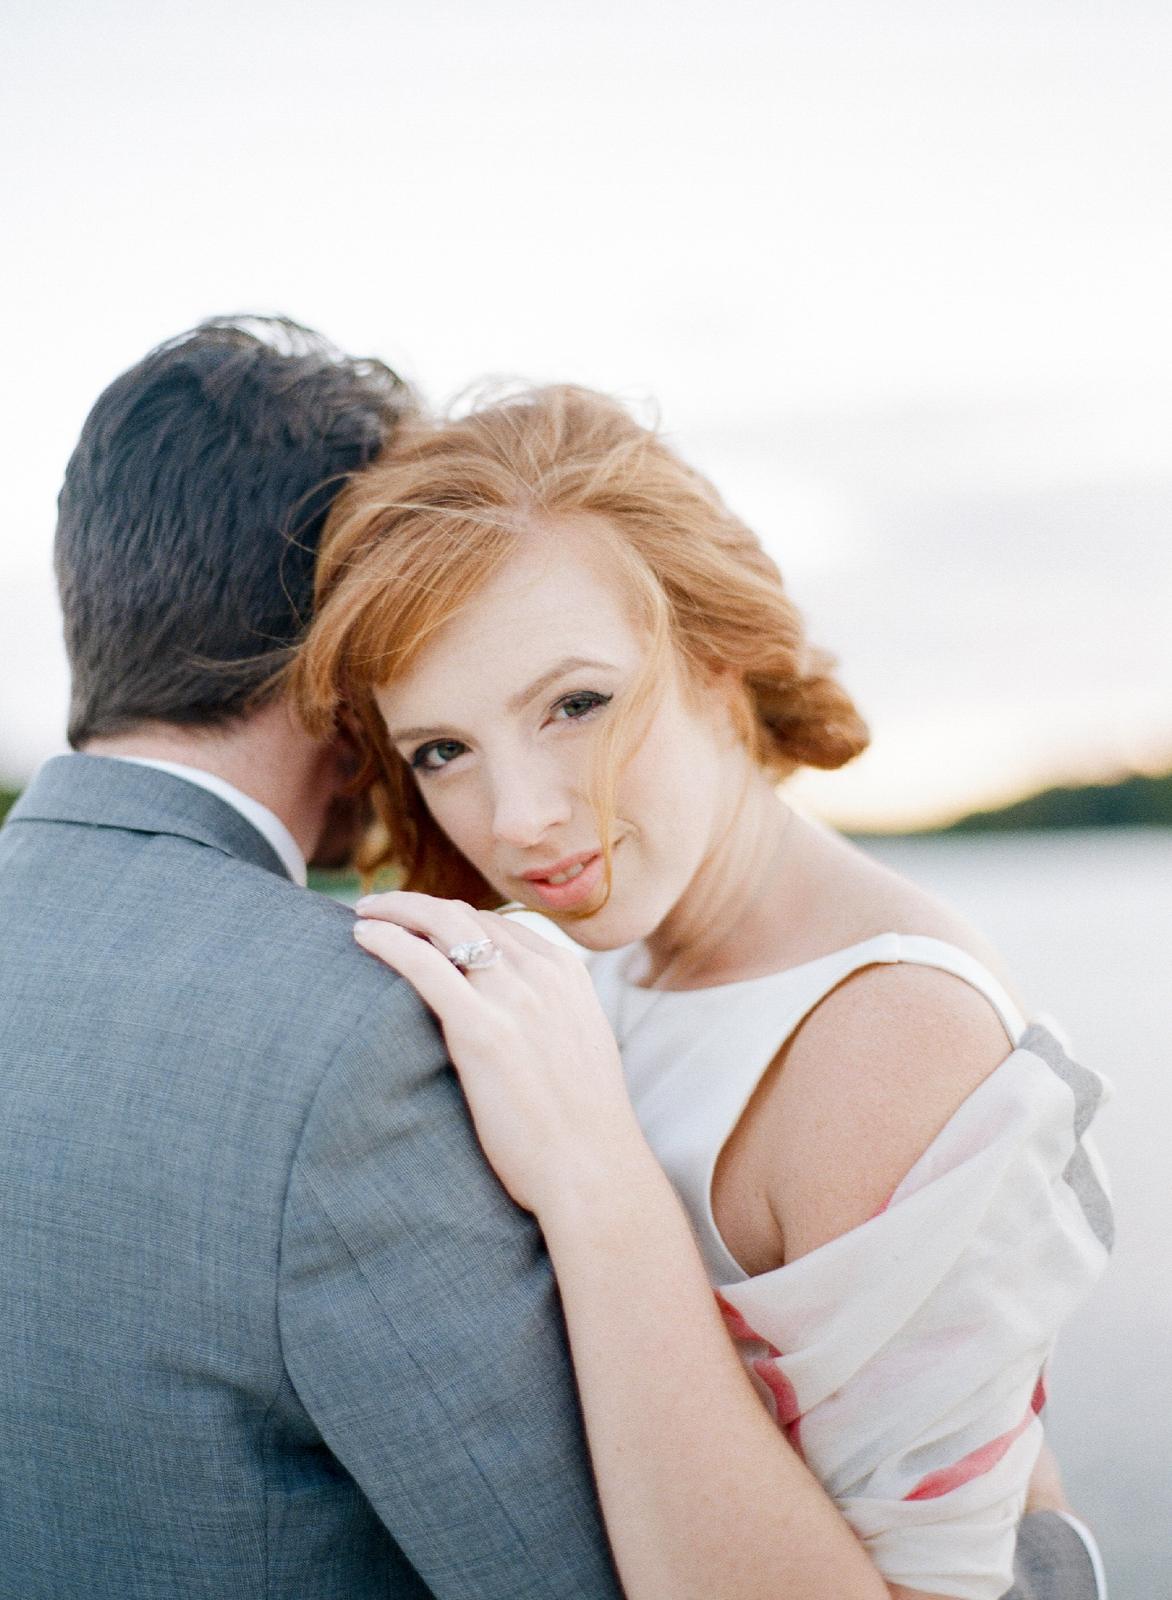 ringwood new jersey wedding photographer shannon griffin_0015.jpg